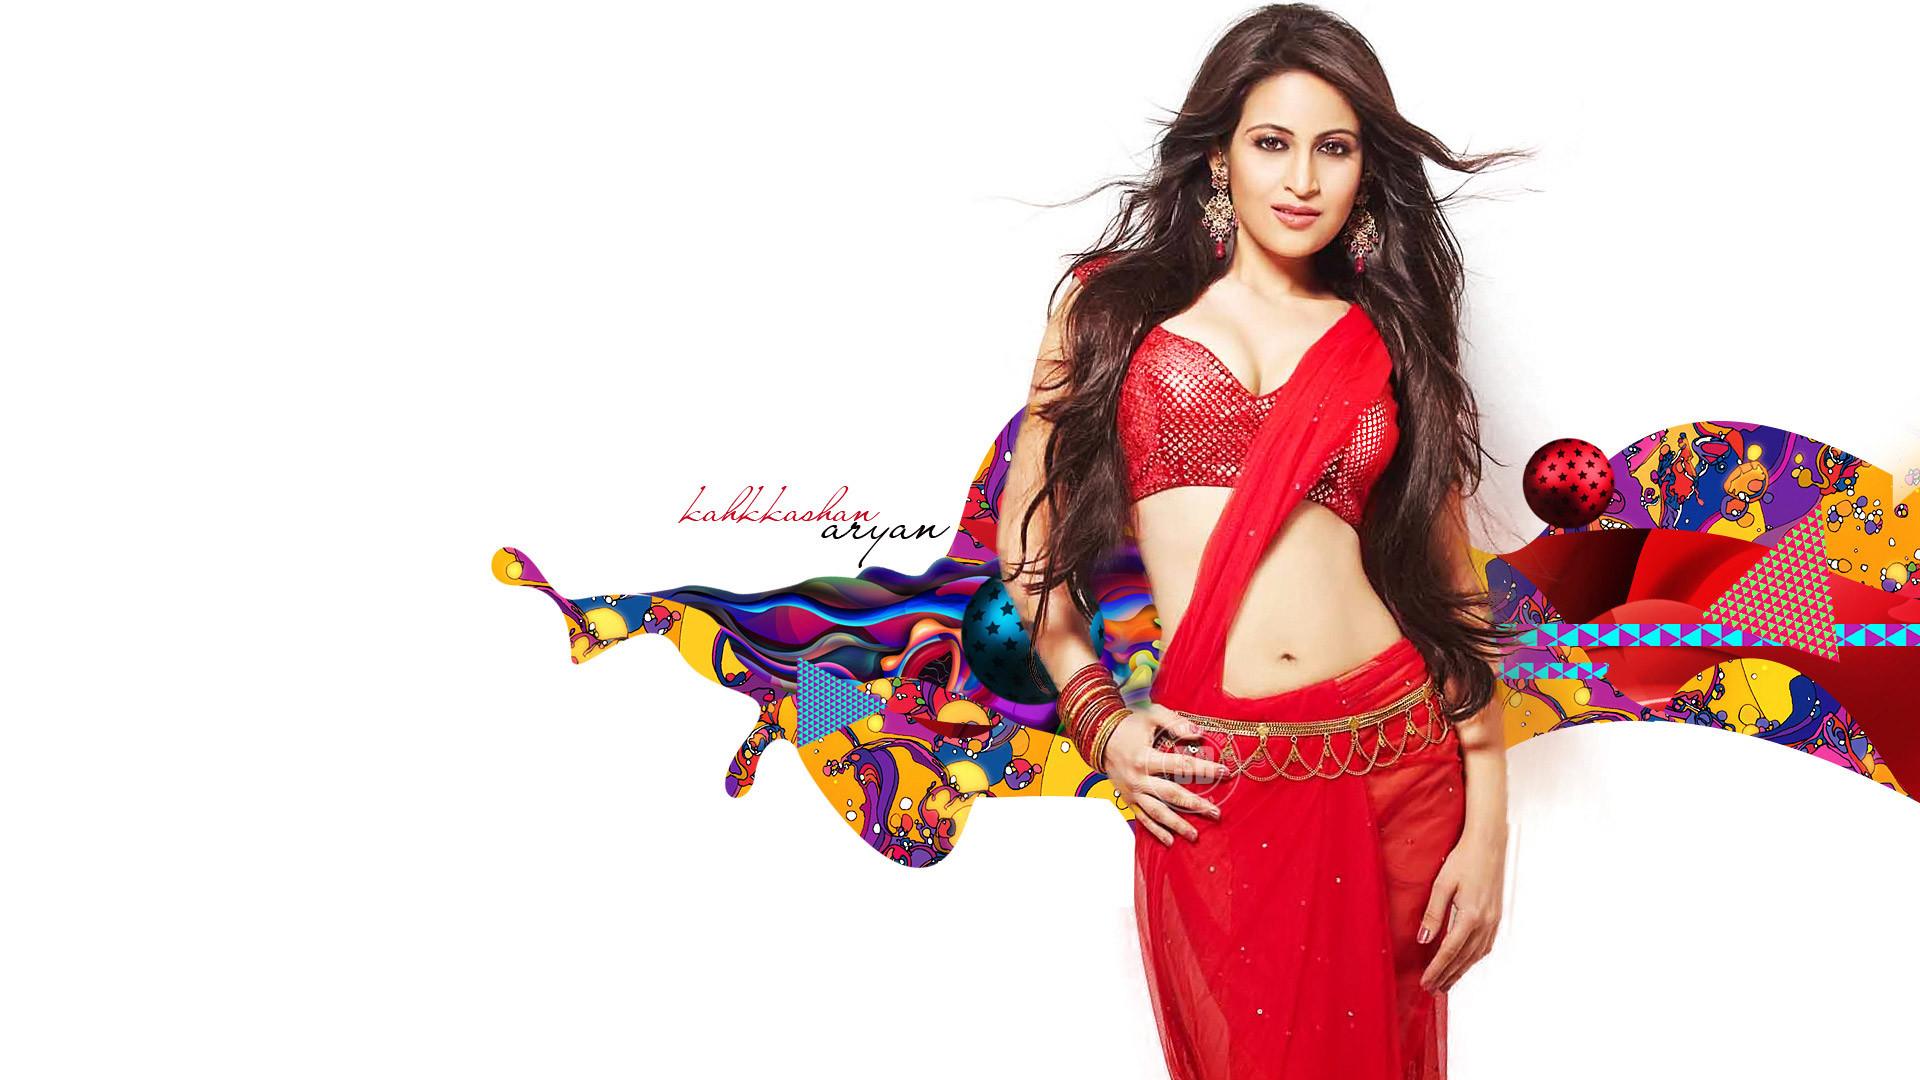 Wiki Free Download Tamanna Bhatia Iphone 5 Picture - Kahkkashan Hot - HD Wallpaper